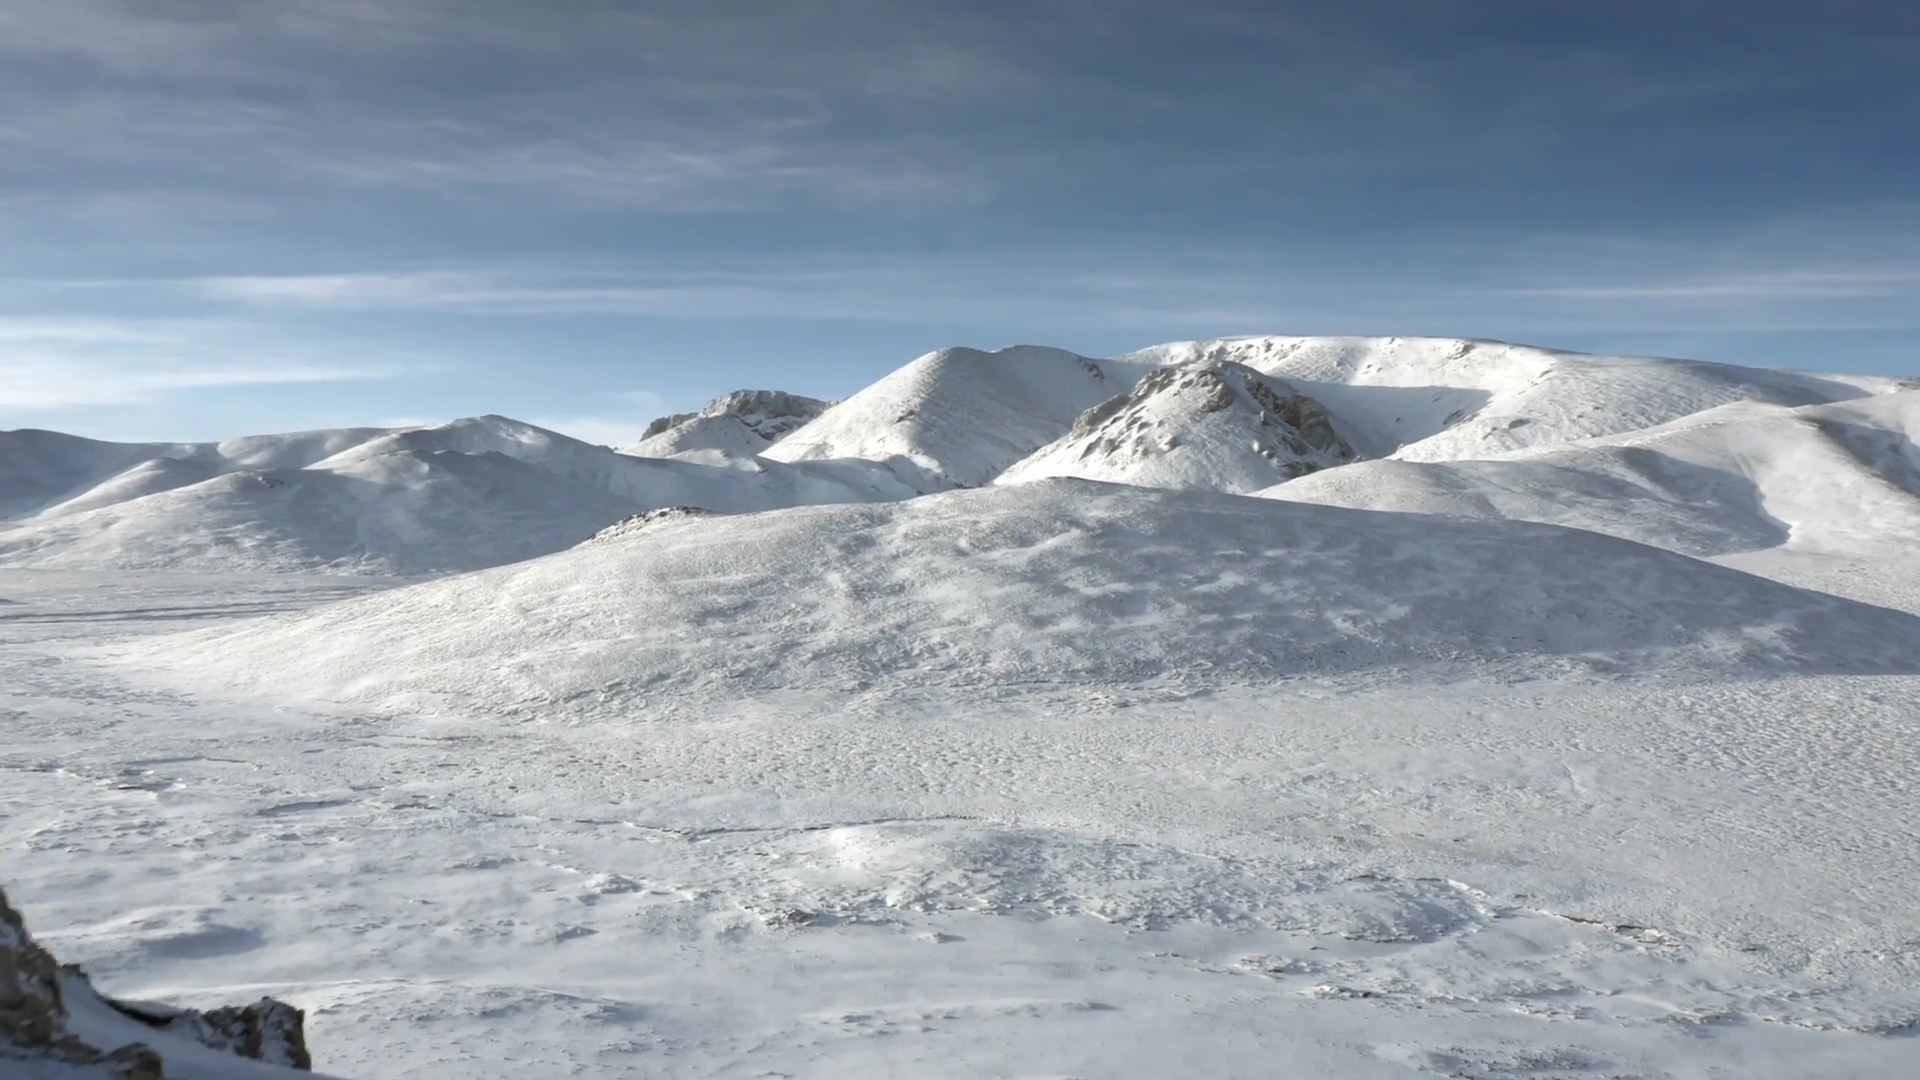 image reine montagne ghost mountain disneynature